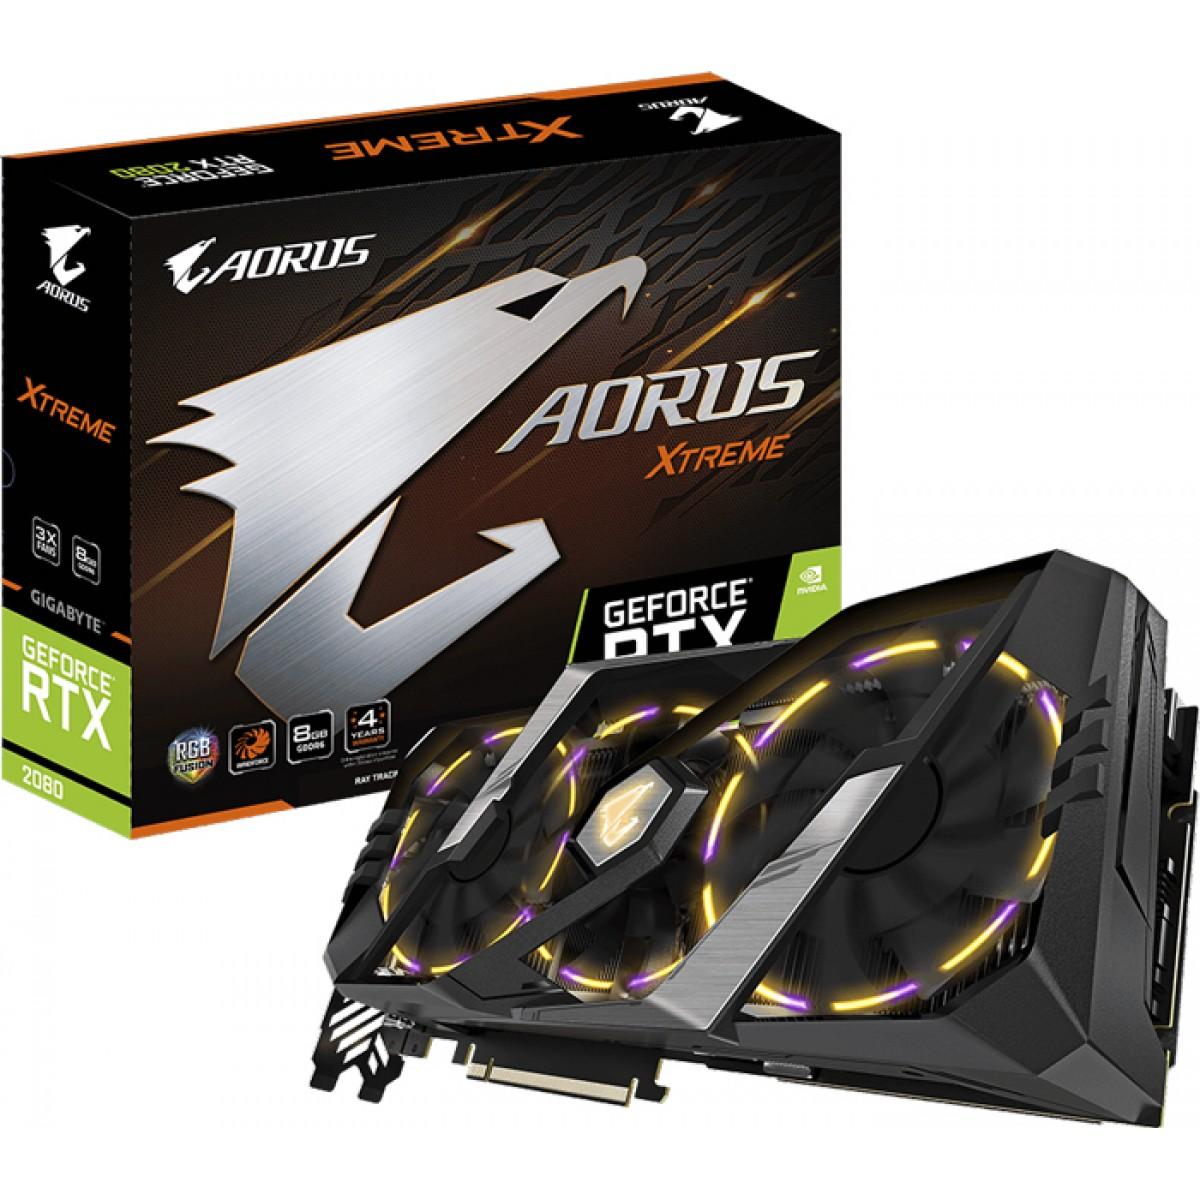 Placa De Vídeo Gigabyte Geforce RTX 2080 Xtreme, 8GB GDDR6, 256Bit, GV-N2080AORUS X-8GC